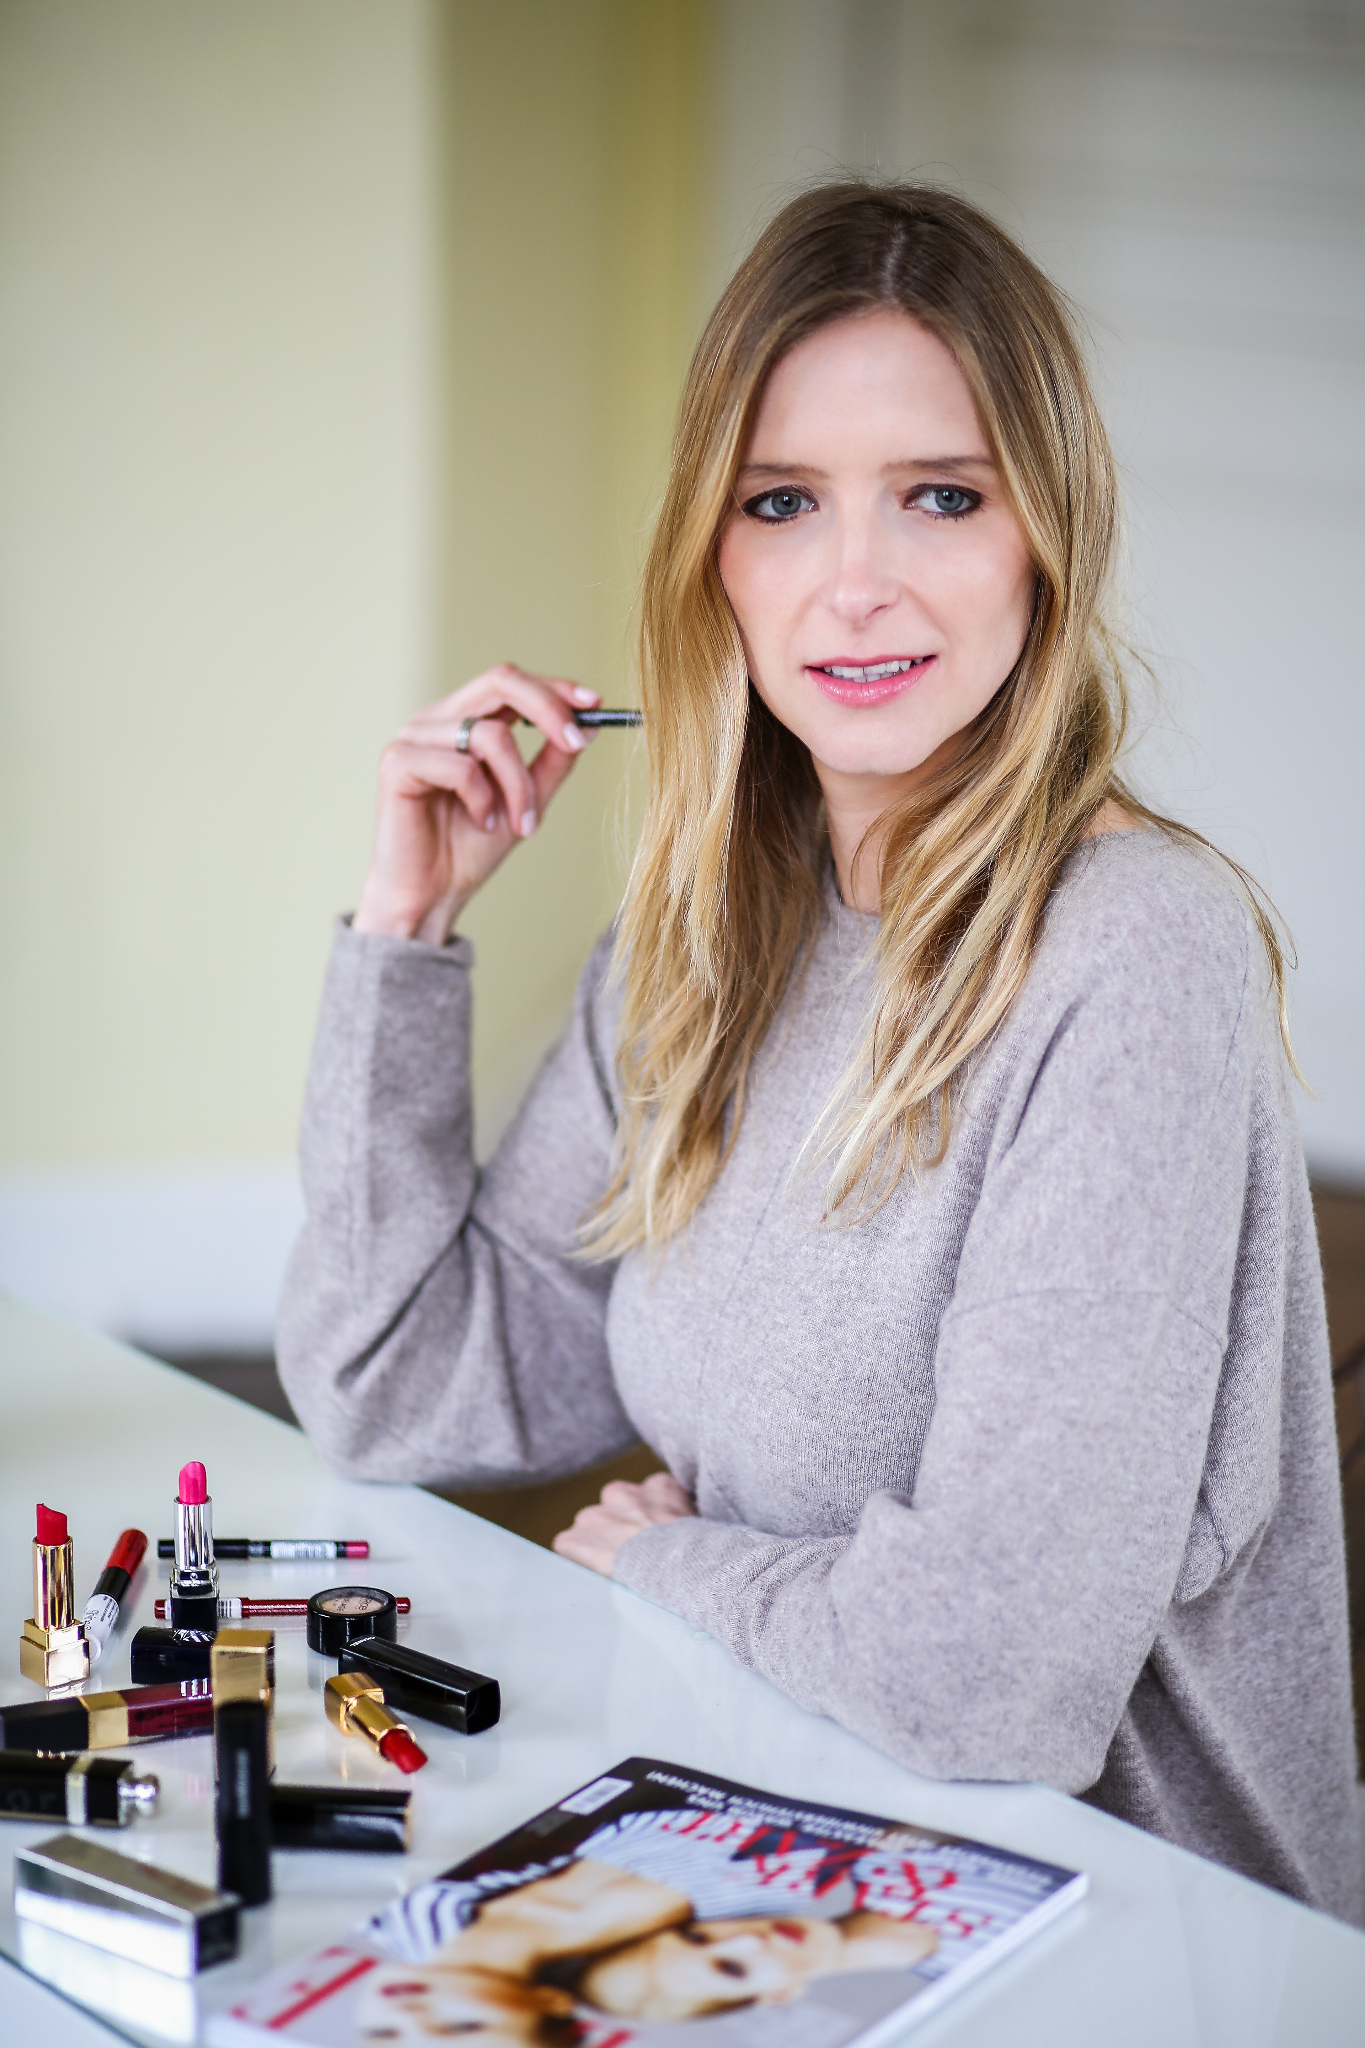 MOD-by-Monique-Lifestyle-Beauty-My-favourite-lipsticks-15